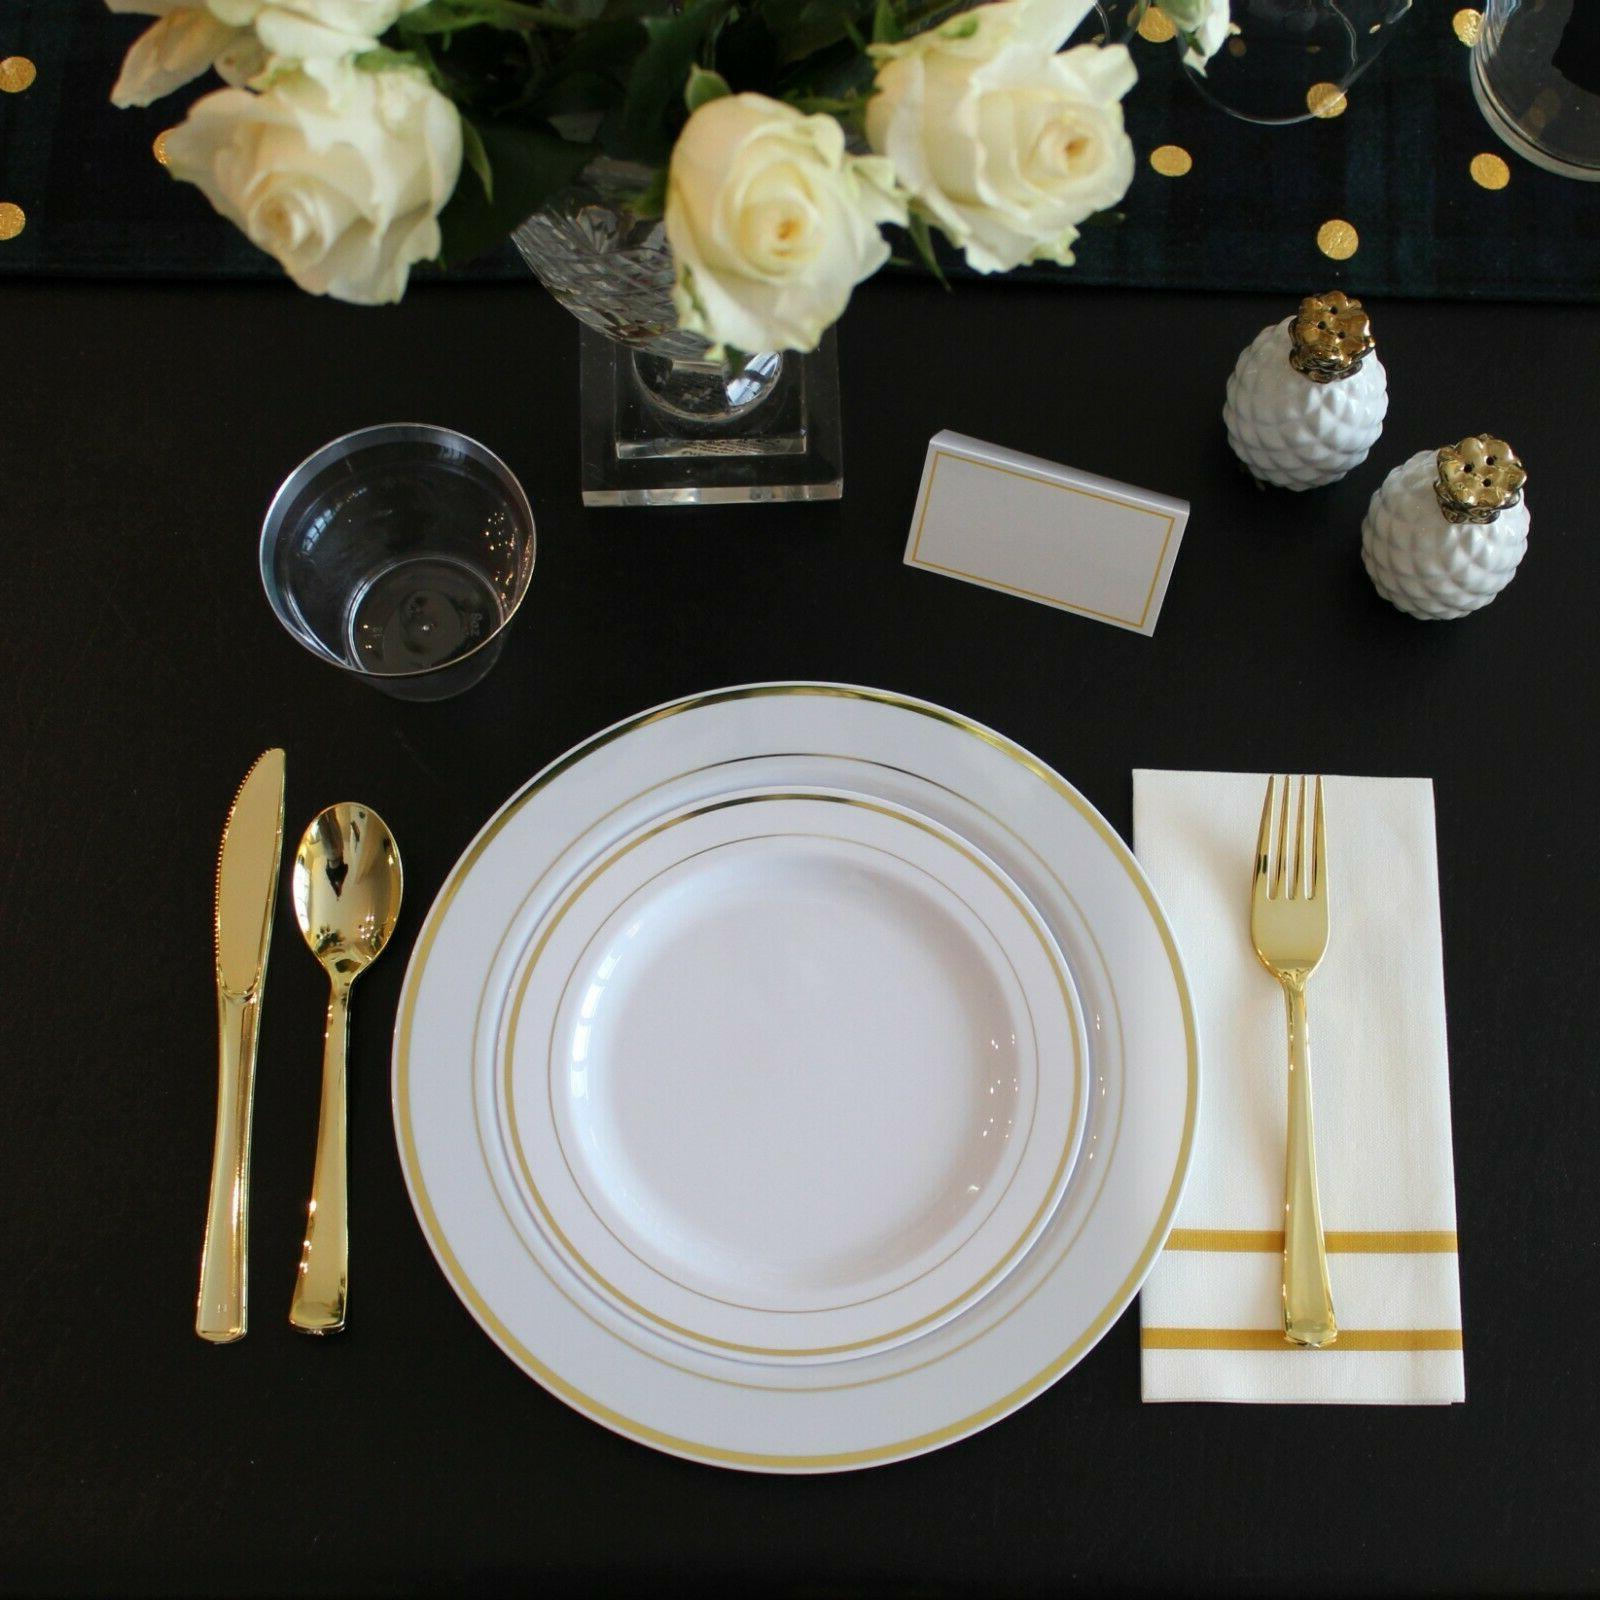 200 Disposable Set Plates 25 Party Guests